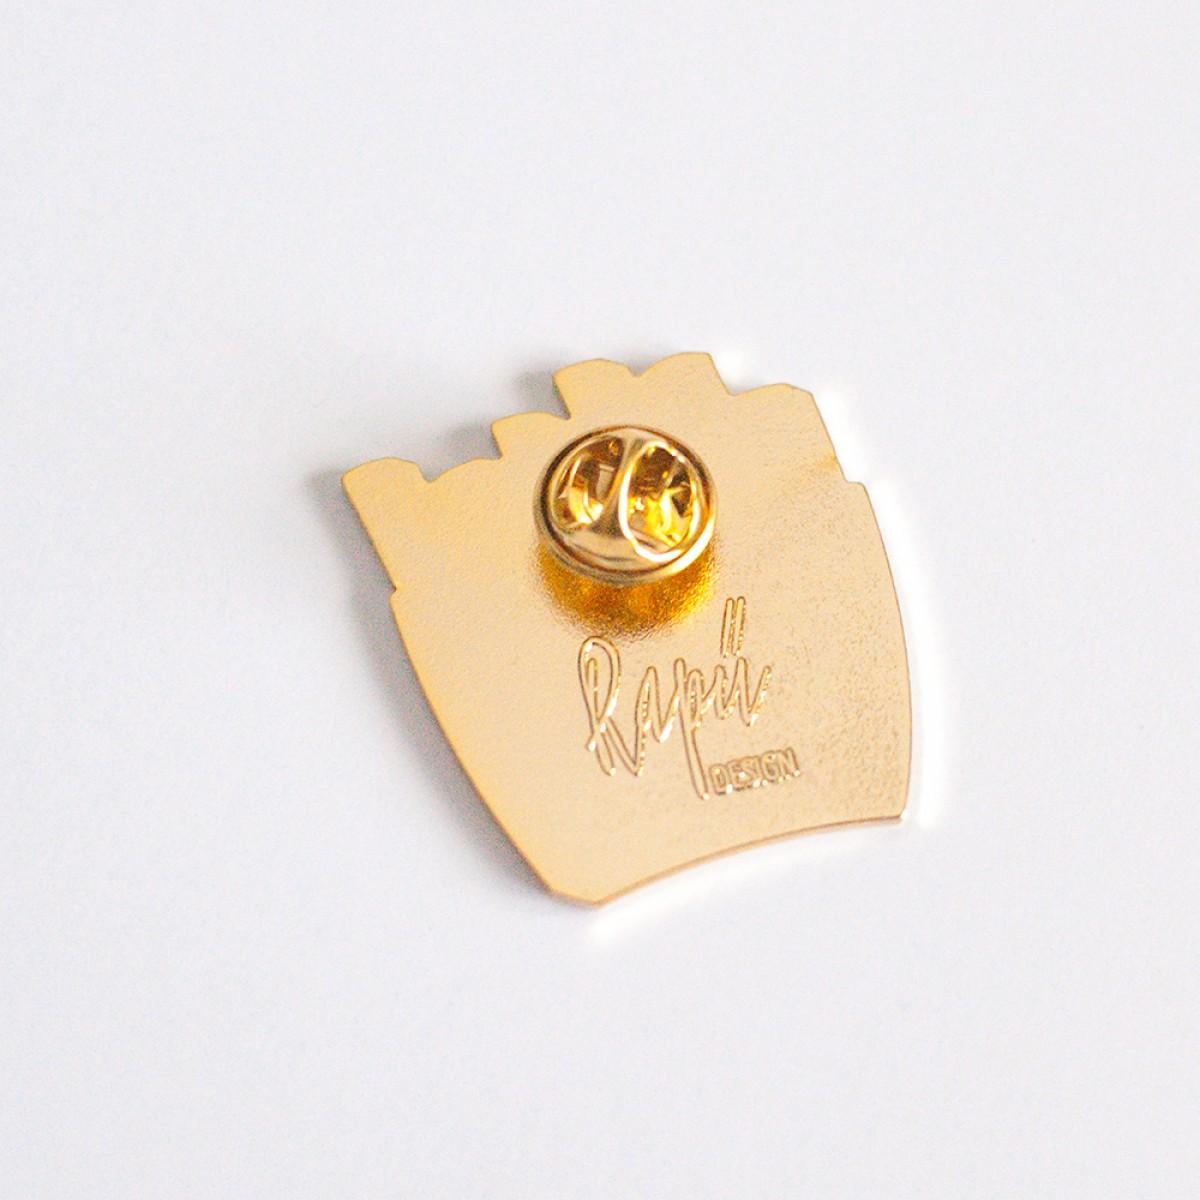 "Rapü Design goldiger Pommes Pin ""Pommunity"""